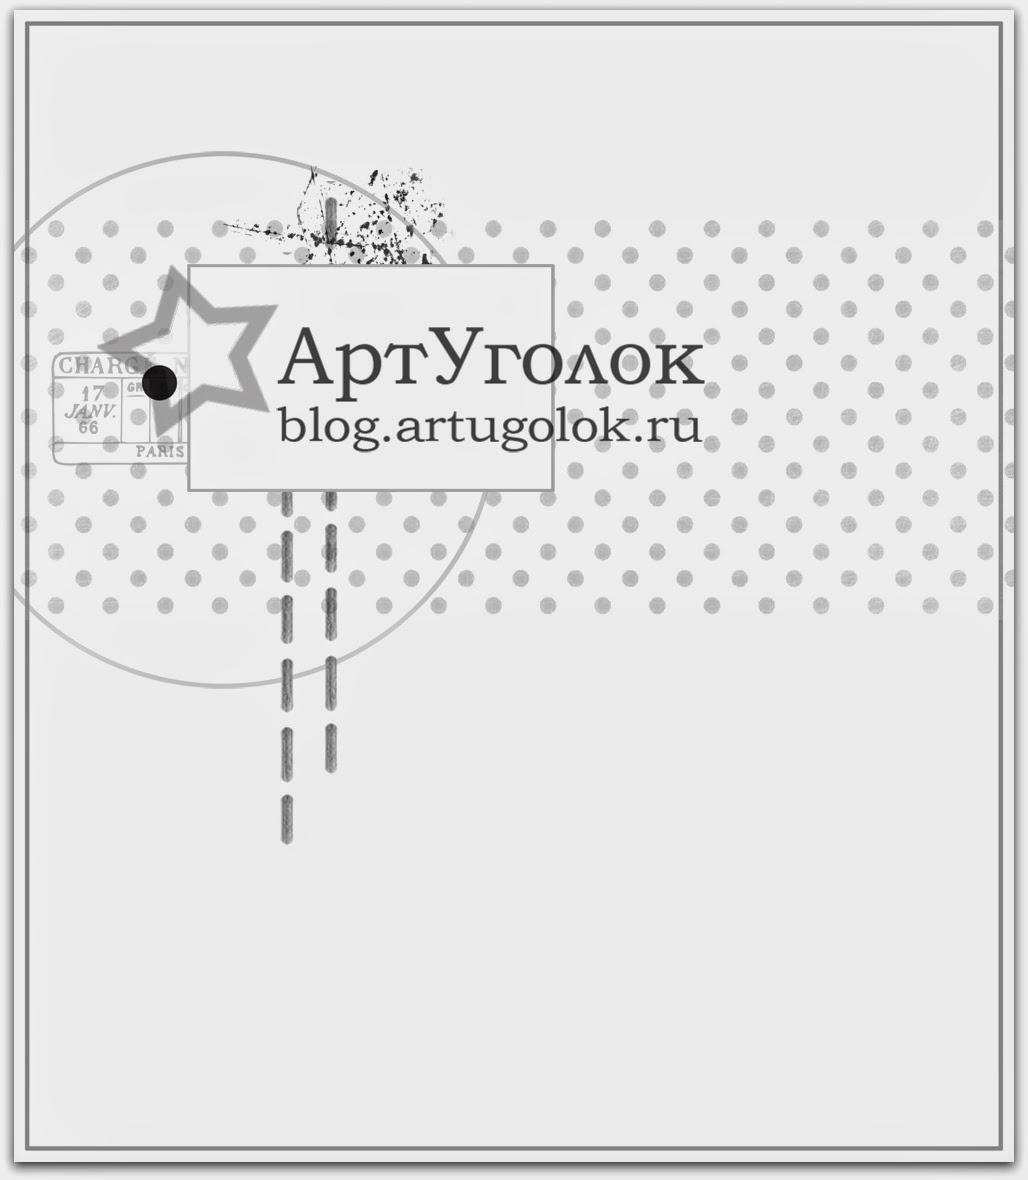 http://blog.artugolok.ru/2014/11/11-2014.html